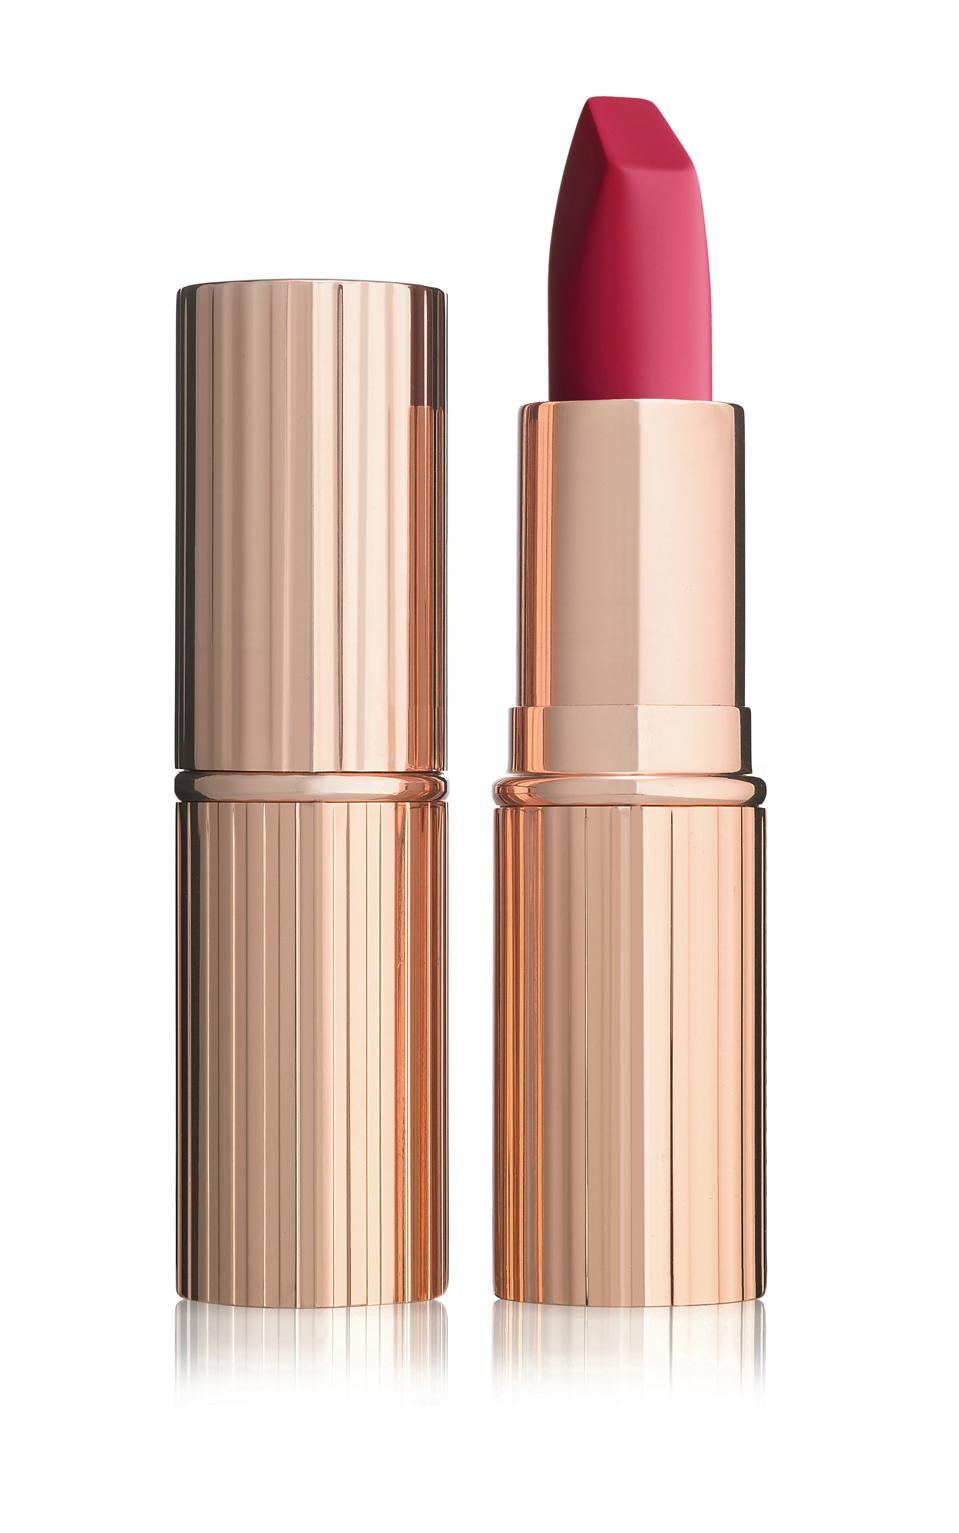 Charlotte Tilbury Matte Revolution Lipstick in The Queen